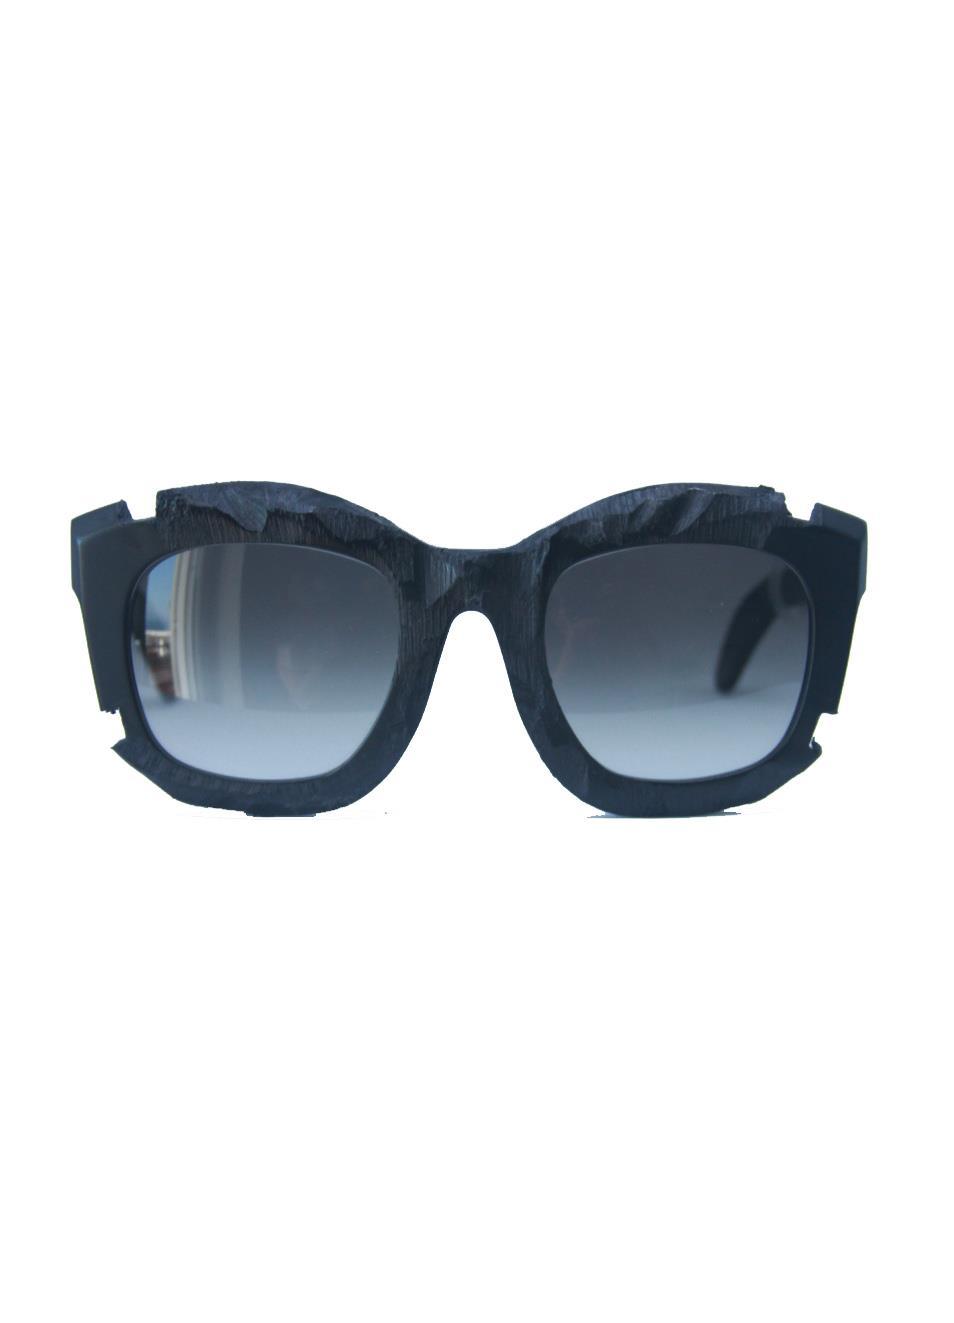 comprare popolare c0e0a 7be0a Kuboraum sunglasses with broken effect frame